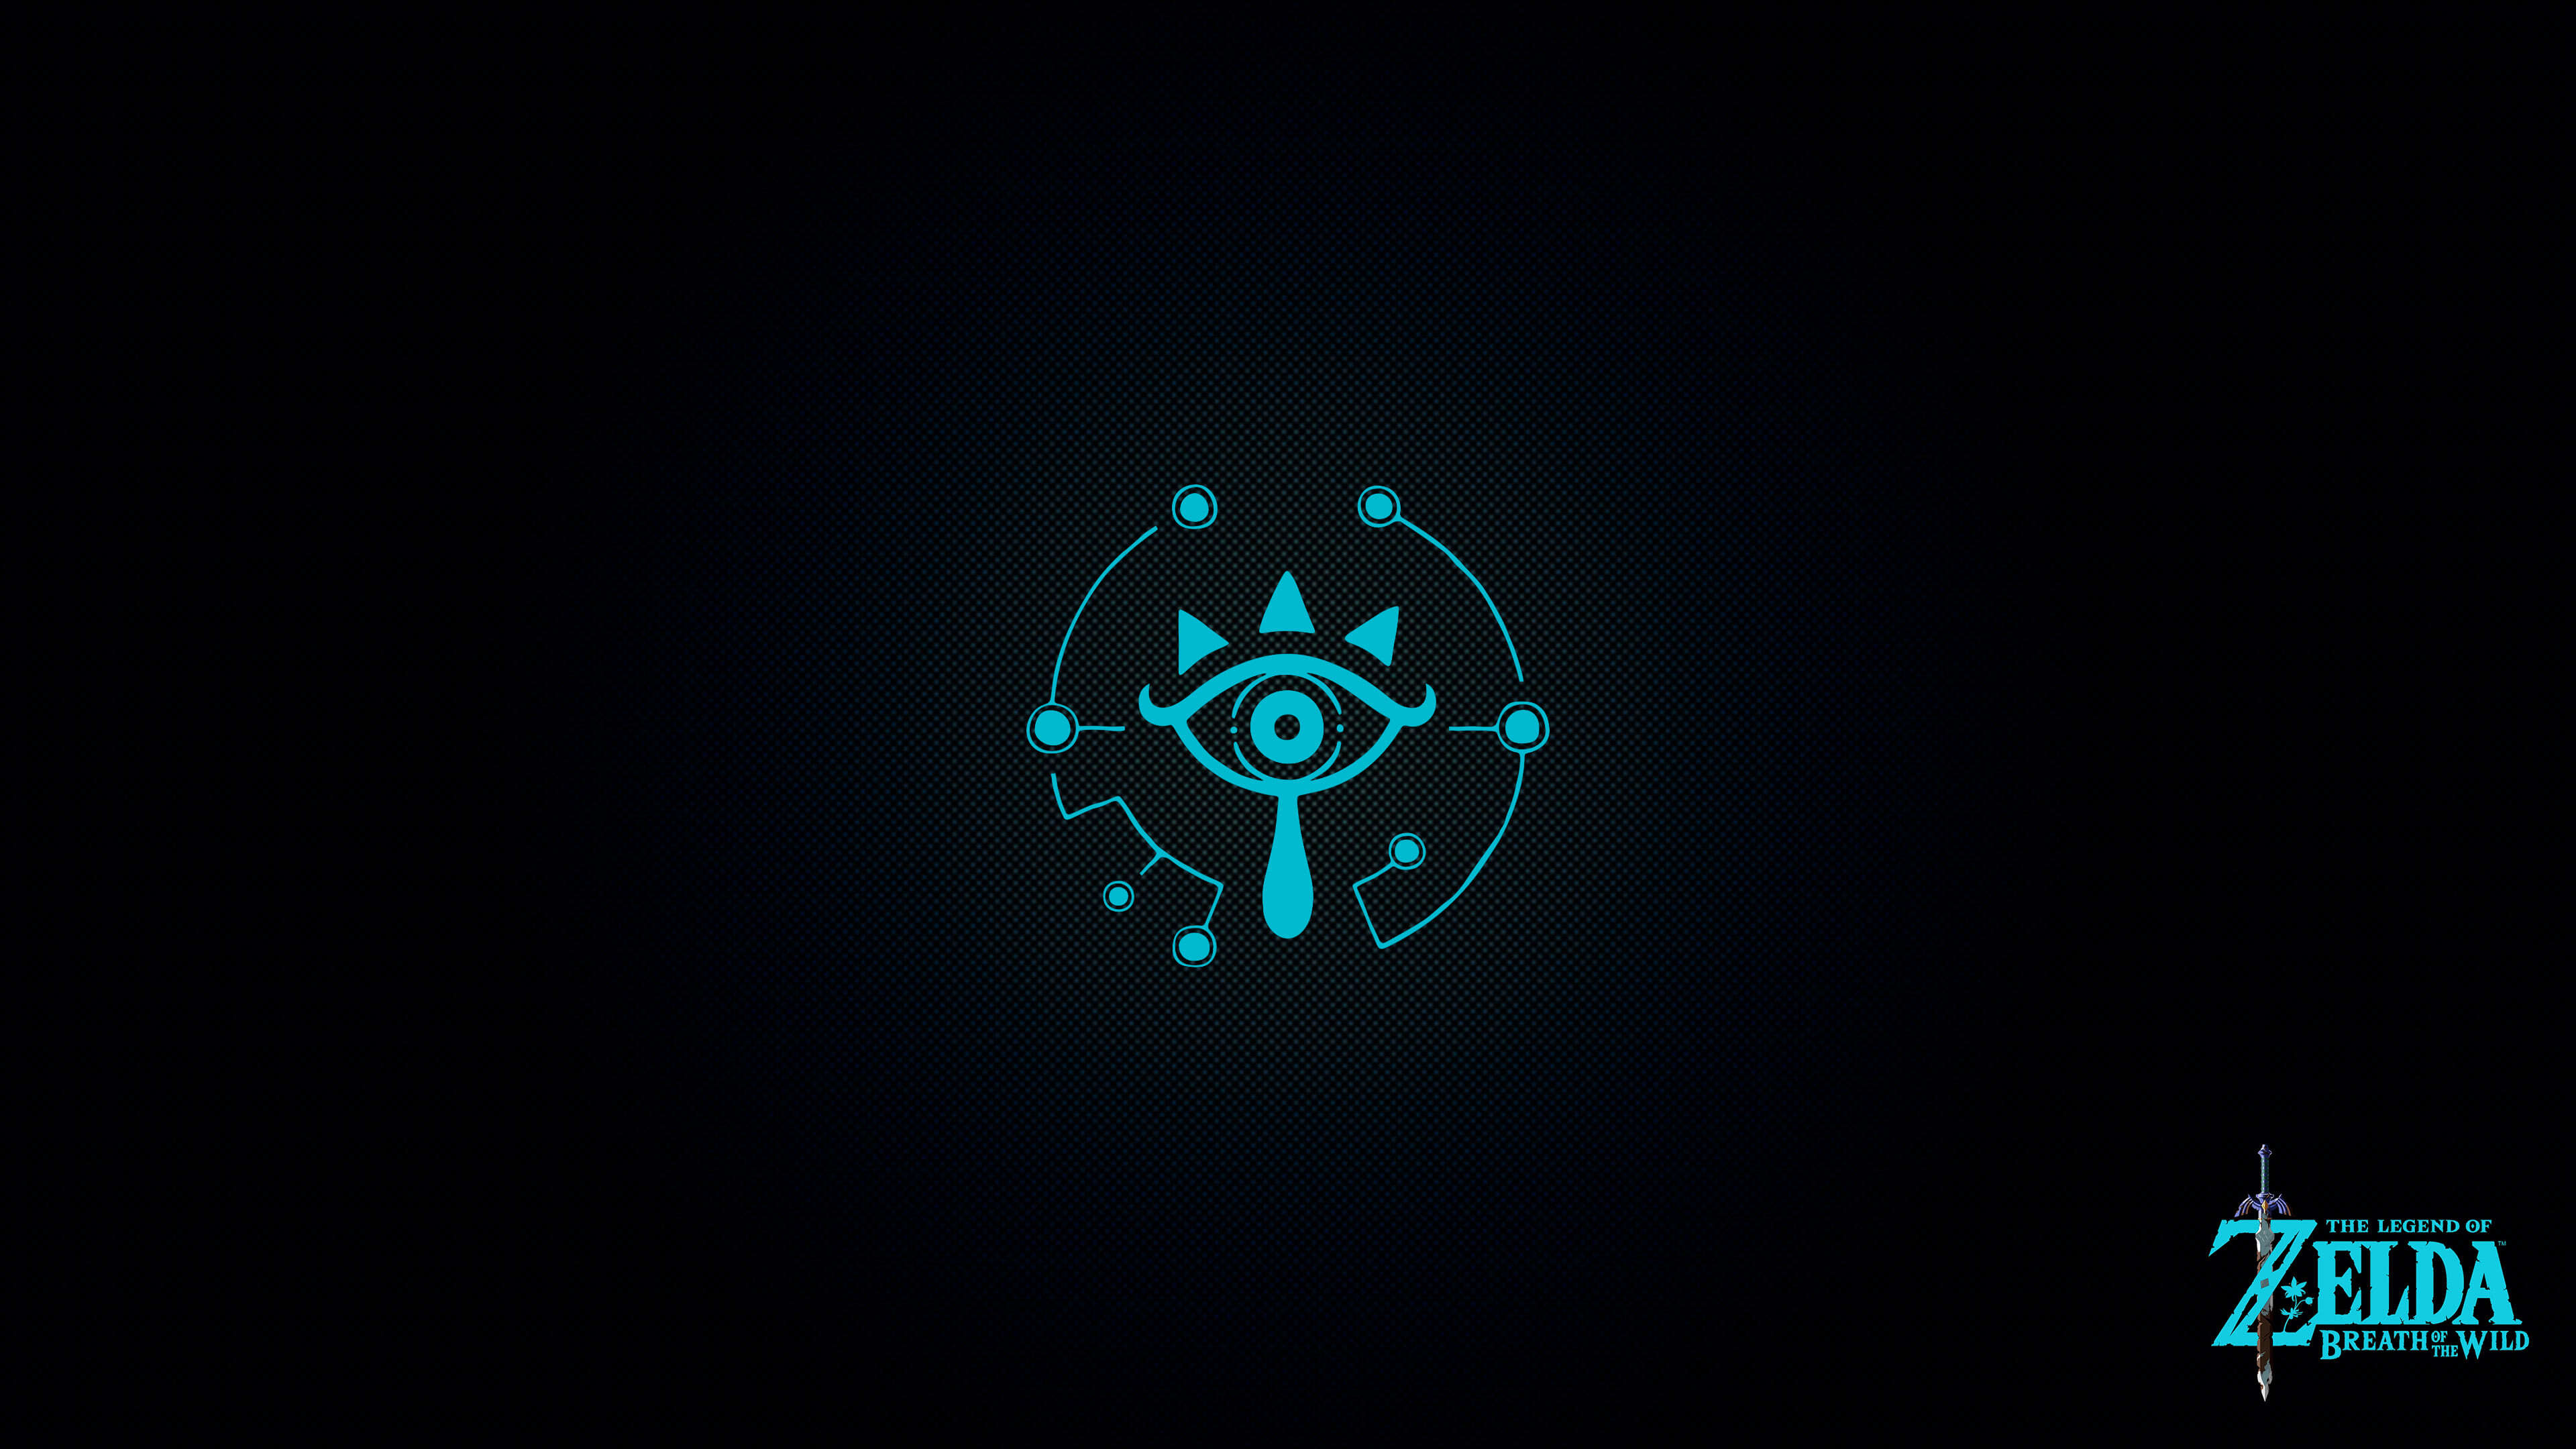 legend of zelda breath of the wild eye symbol uhd 4k wallpaper